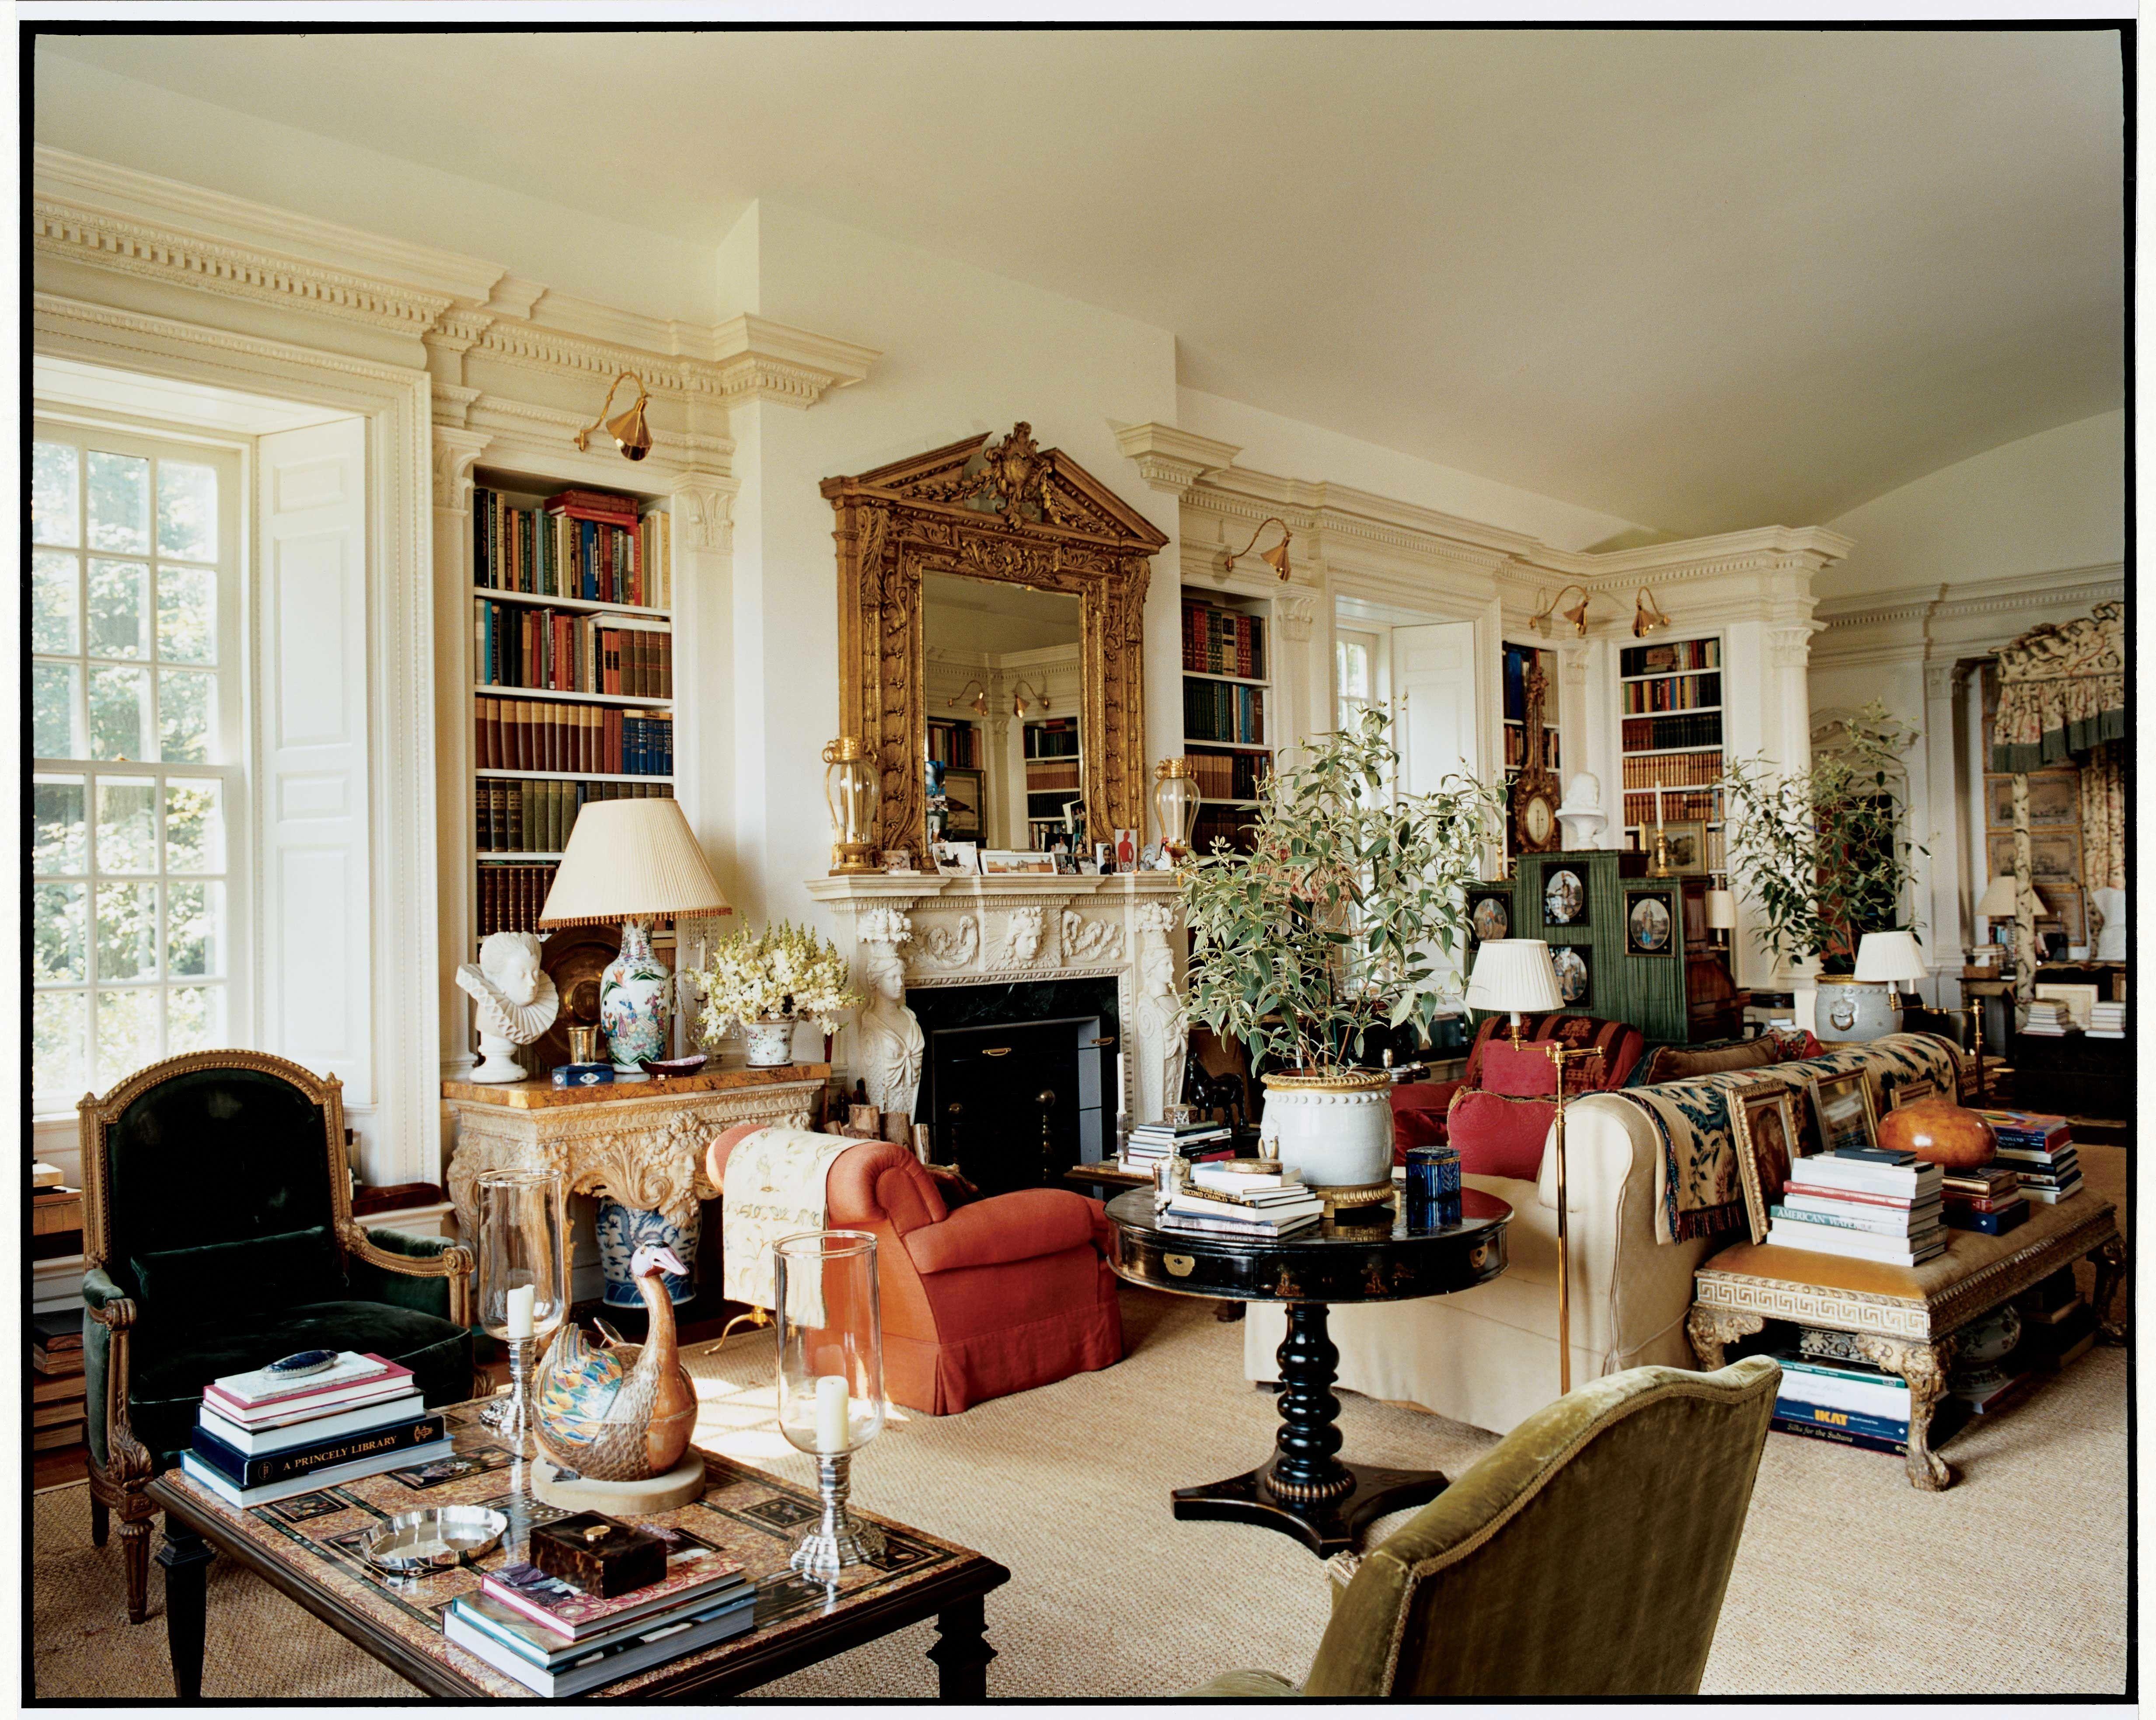 Annette de la rentas magnificent bedroom but also could use this design for a living